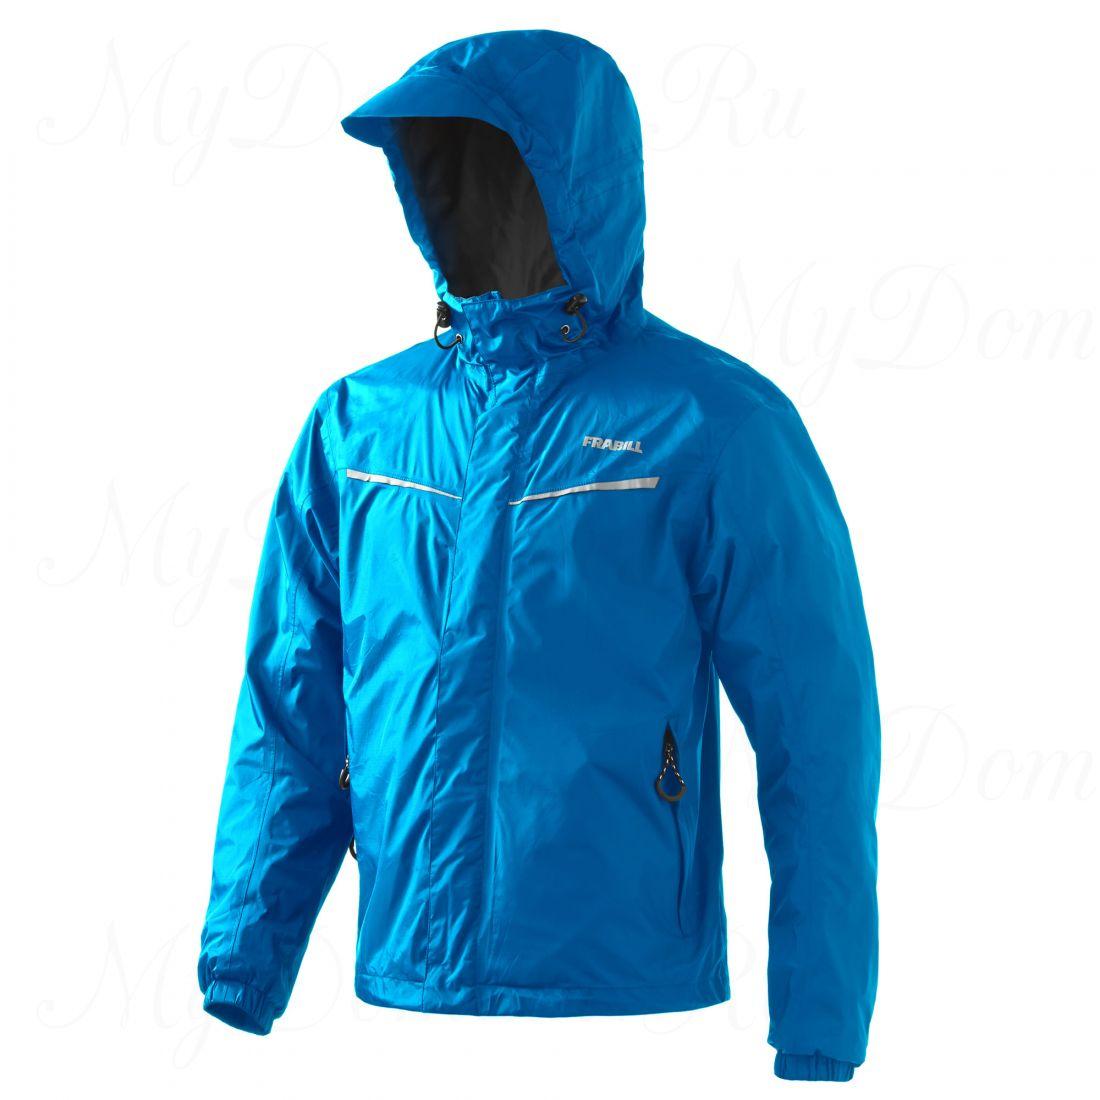 Куртка штормовая FRABILL Stow Jacket Costal Blue, р. 2XL